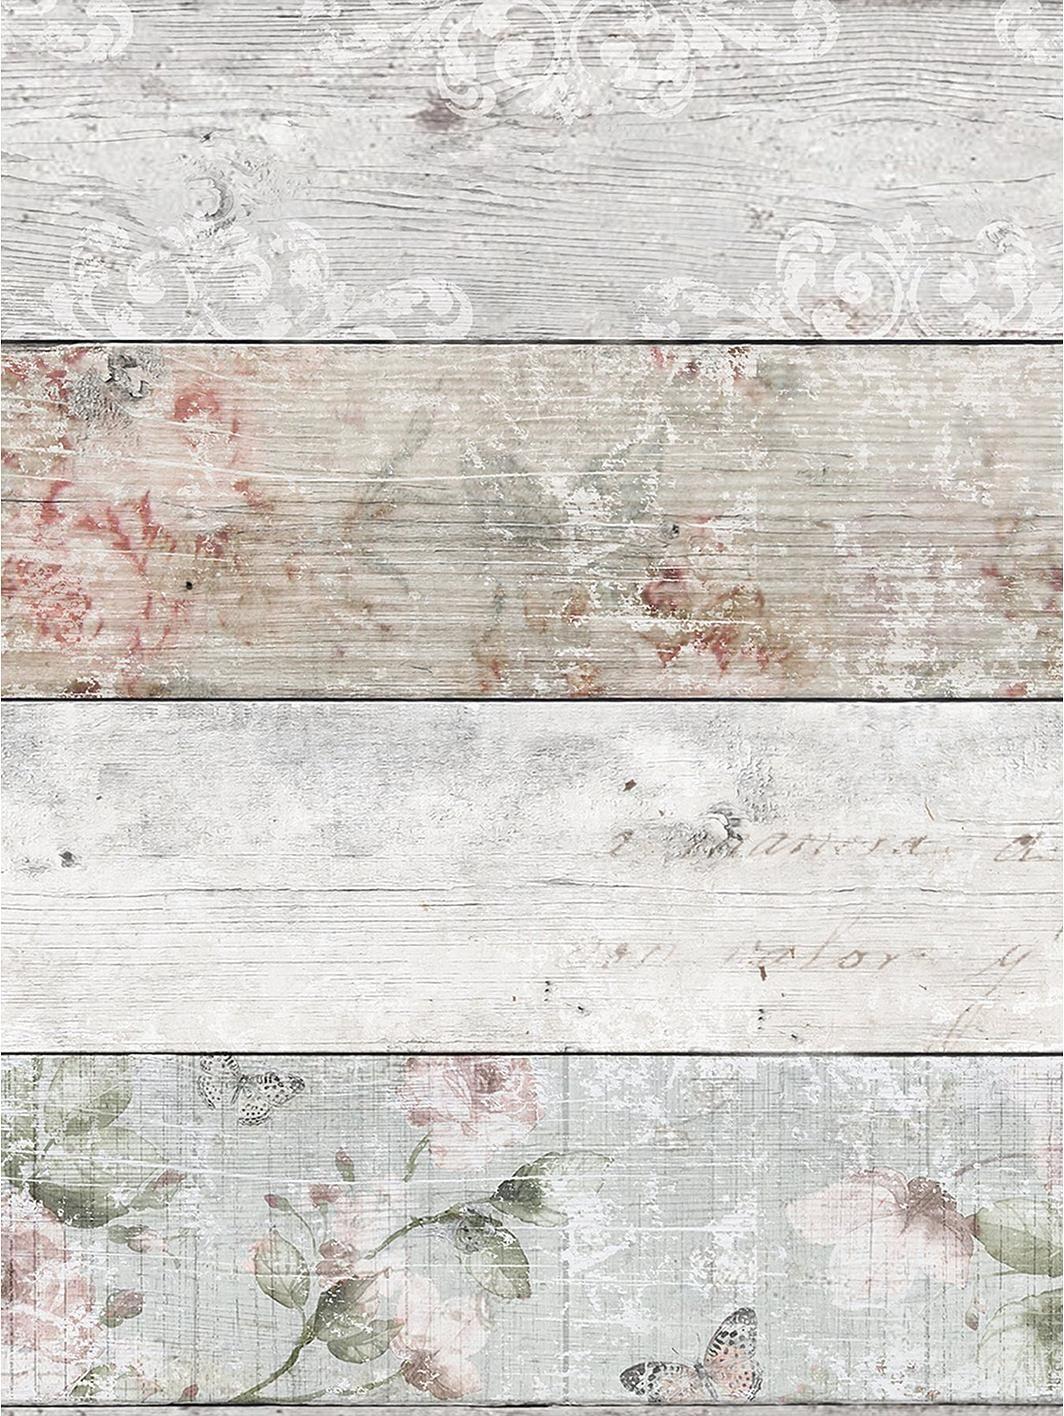 Distressed Wood Floral Wallpaper Distressed Wood Wallpaper How To Distress Wood Wood Wallpaper